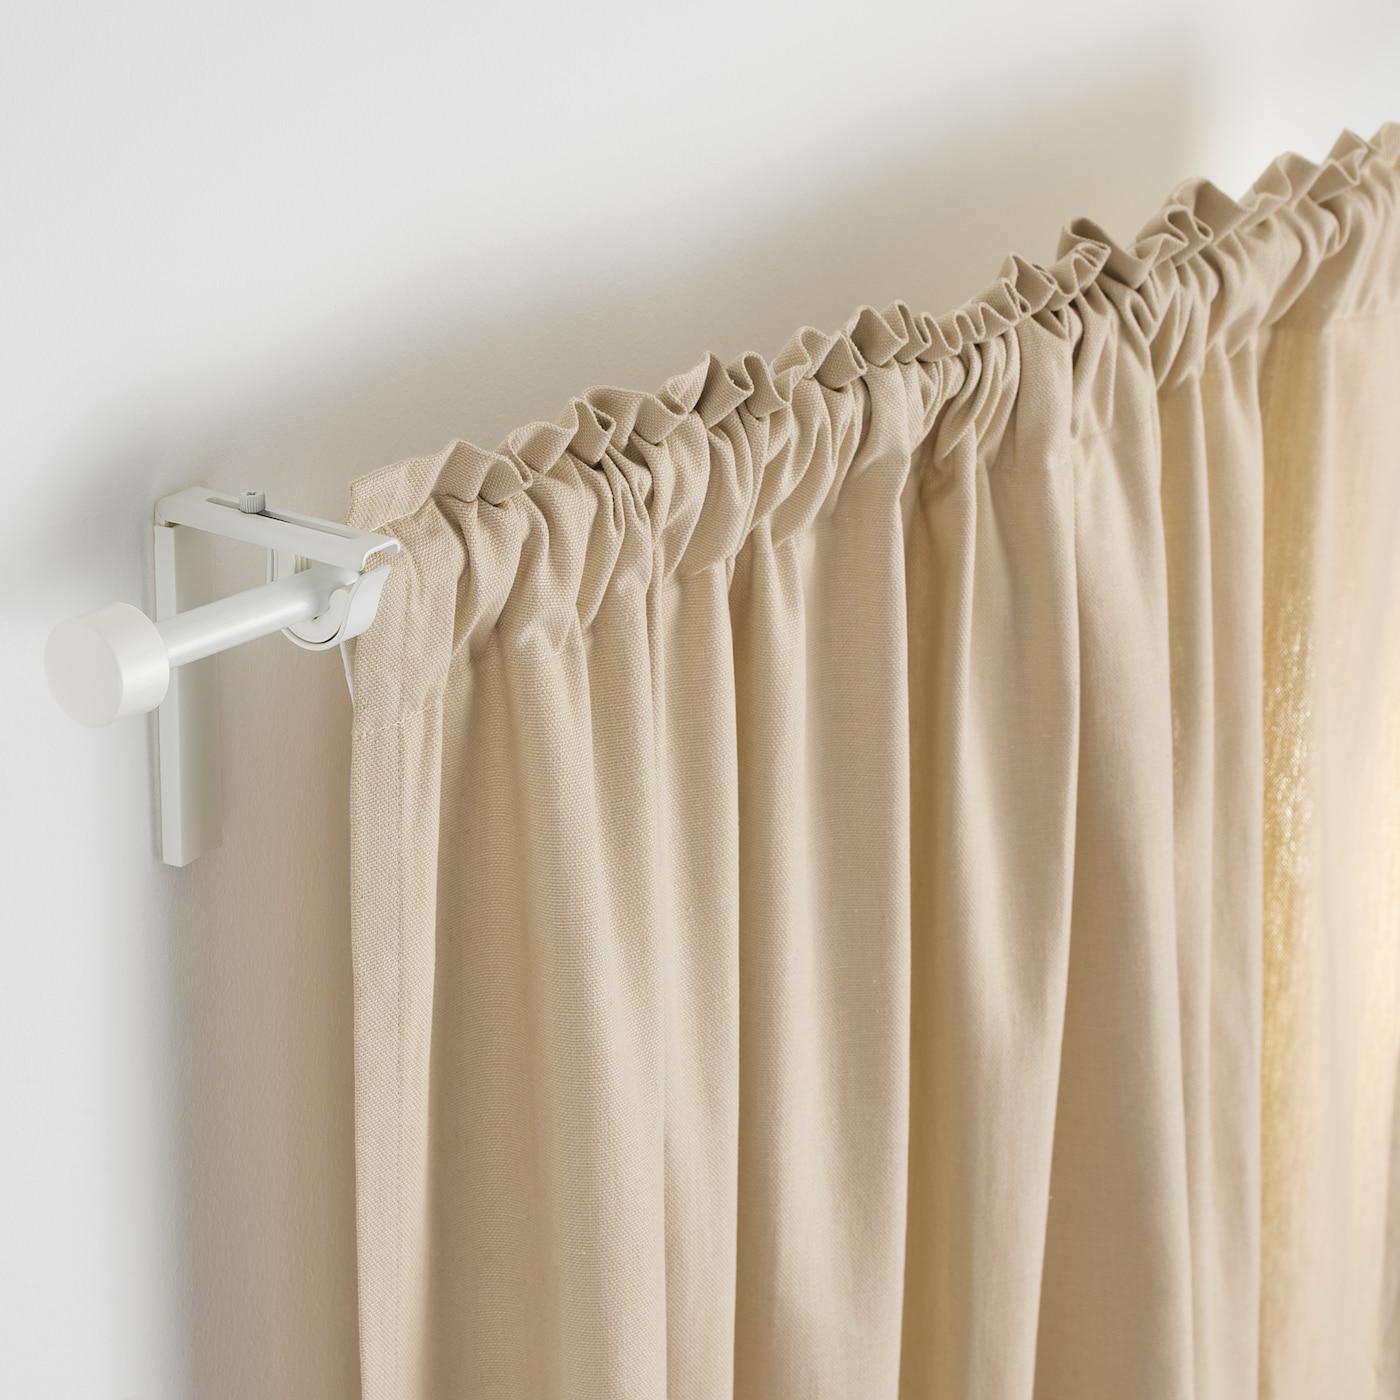 RÄCKA black, Curtain rod, 210 385 cm IKEA